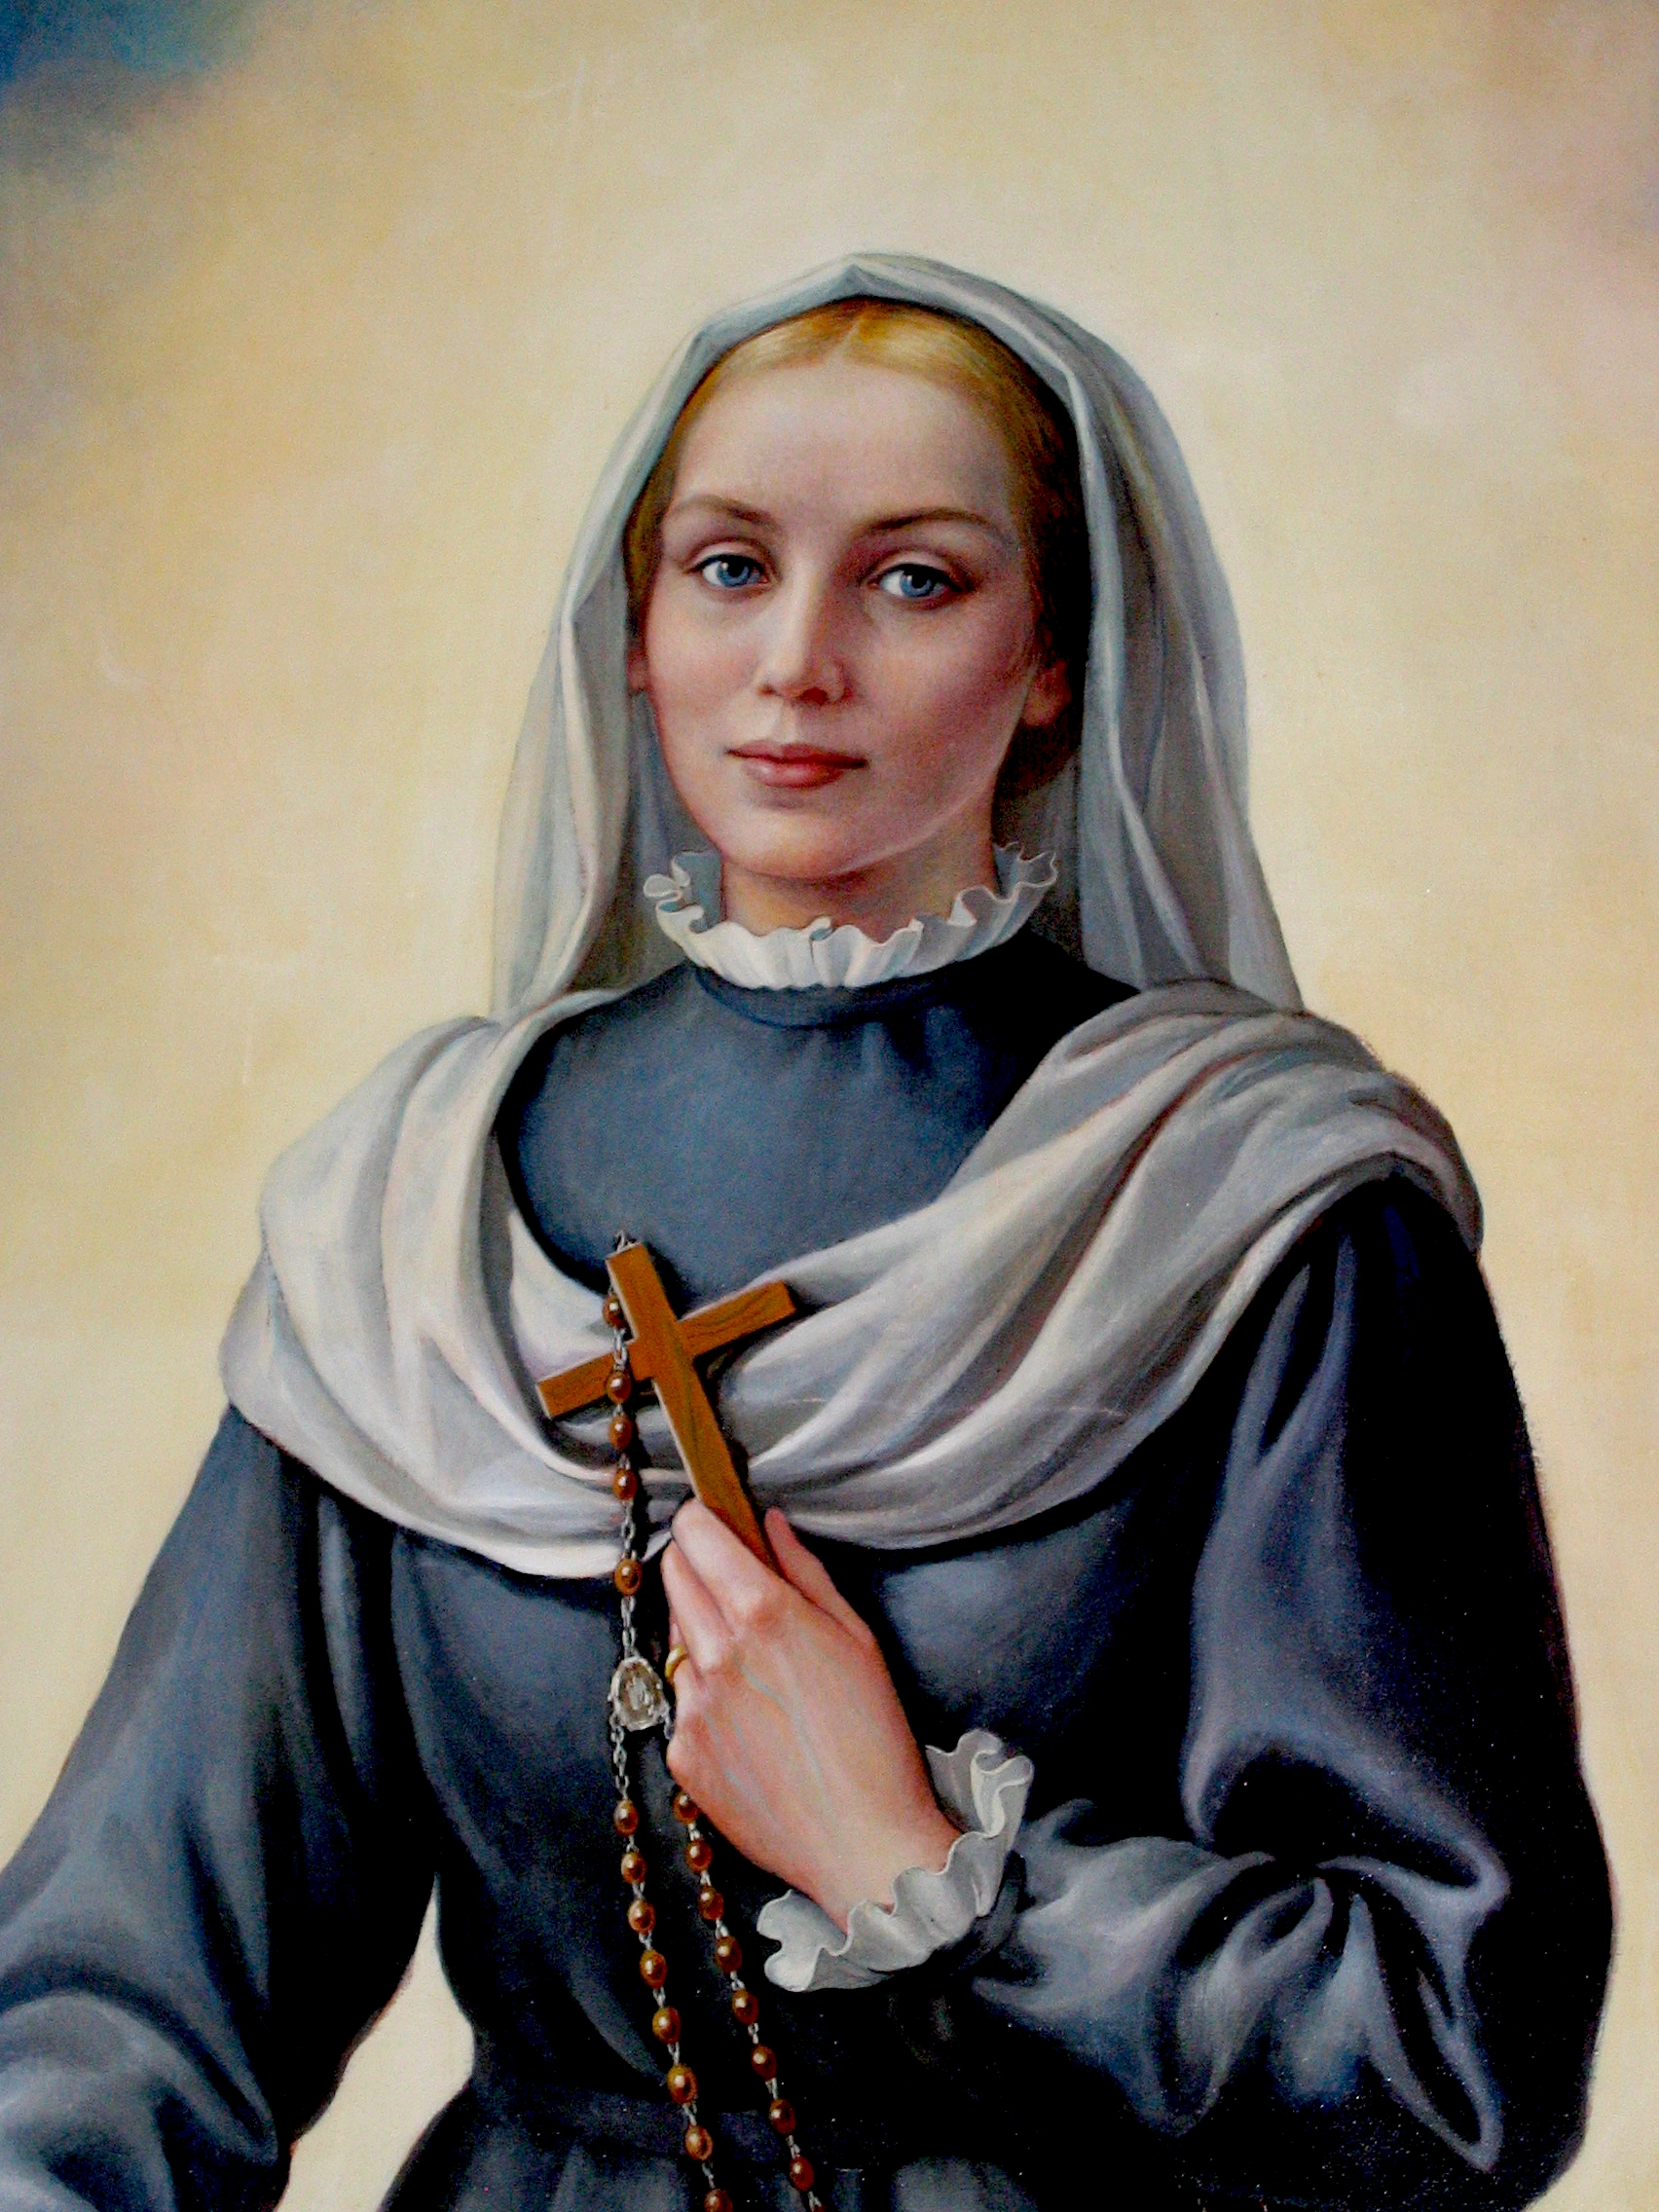 sveta Virginija Centurione Bracelli - vdova in redovnica